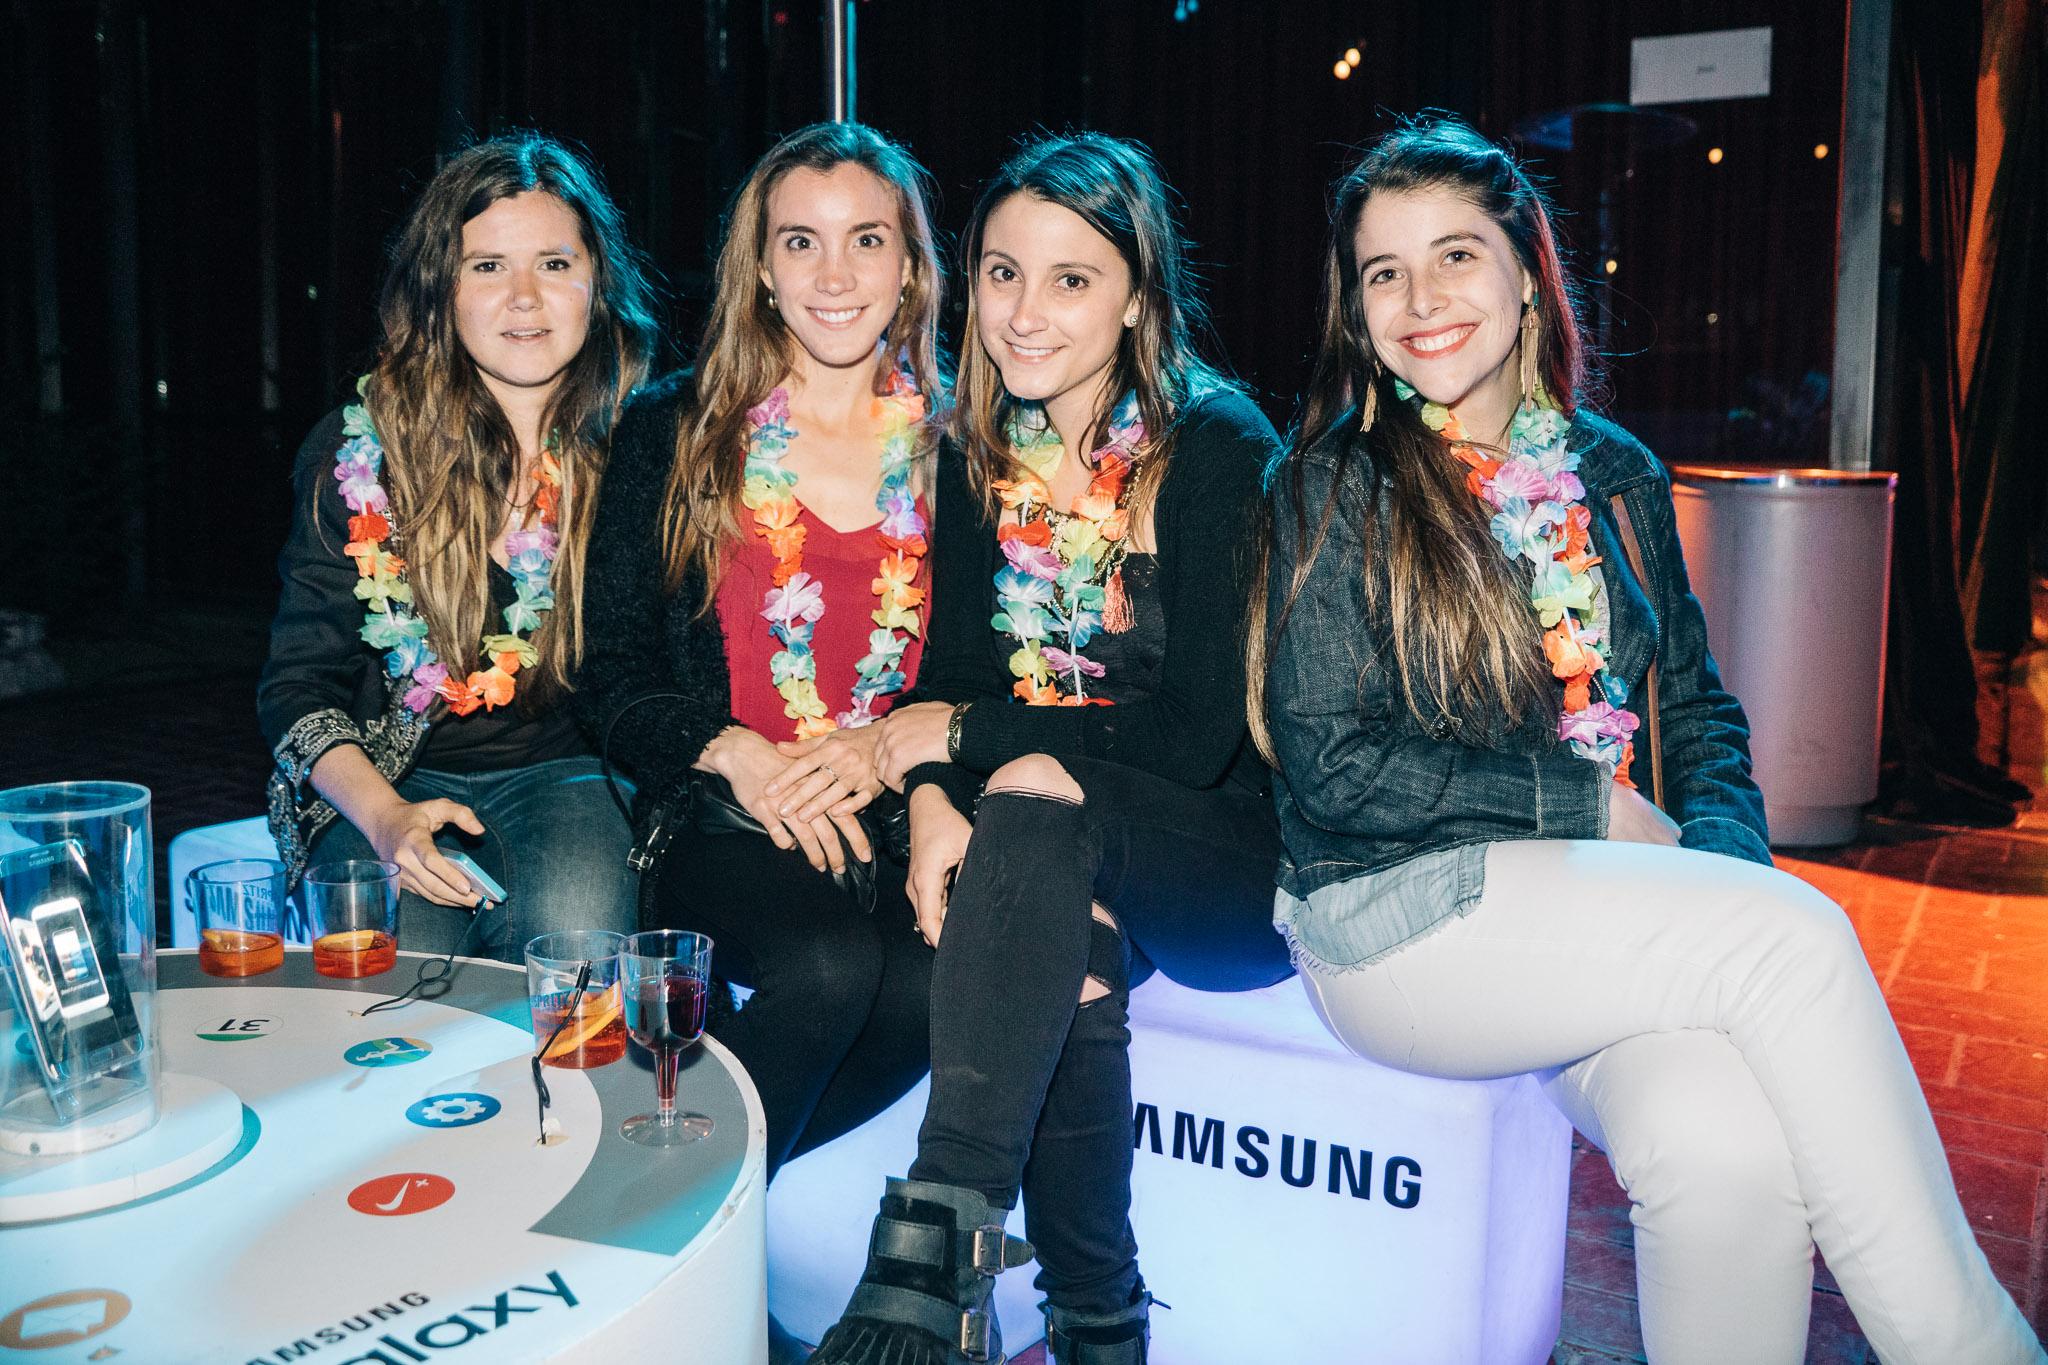 Camila Jaureguiberry, Teresa Quiroga, Francisca Toro y Catalina Bozzo.